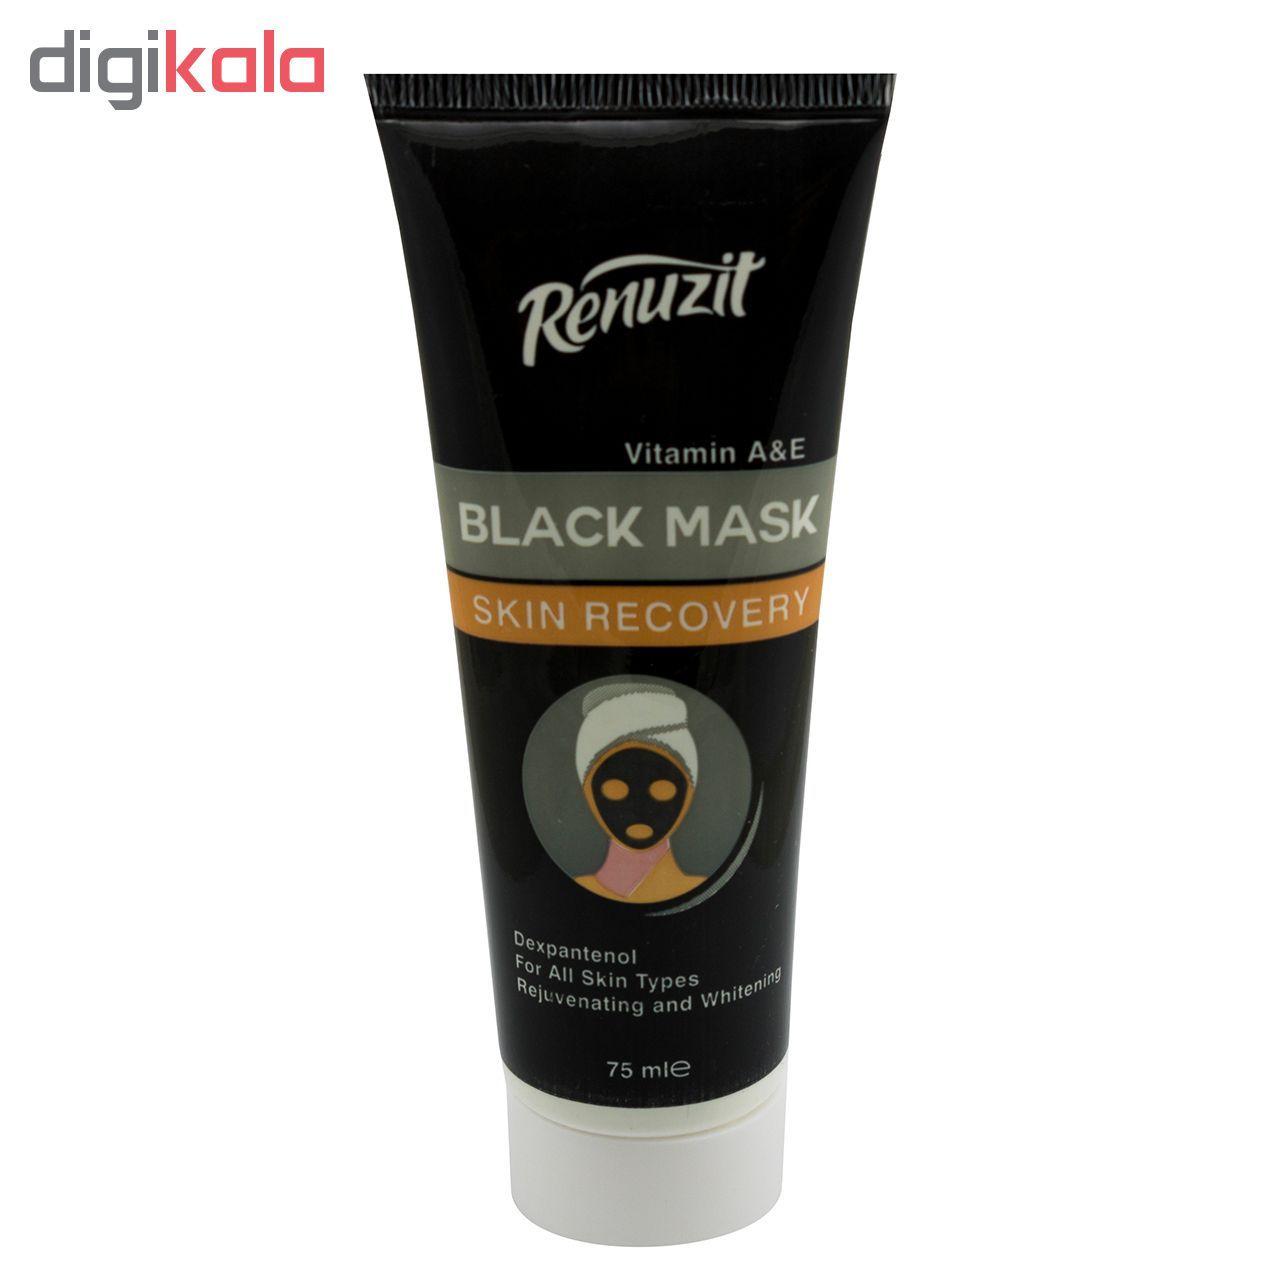 ماسک صورت رینو زیت مدل Black mask carbon active حجم 75 میلی لیتر -  - 2